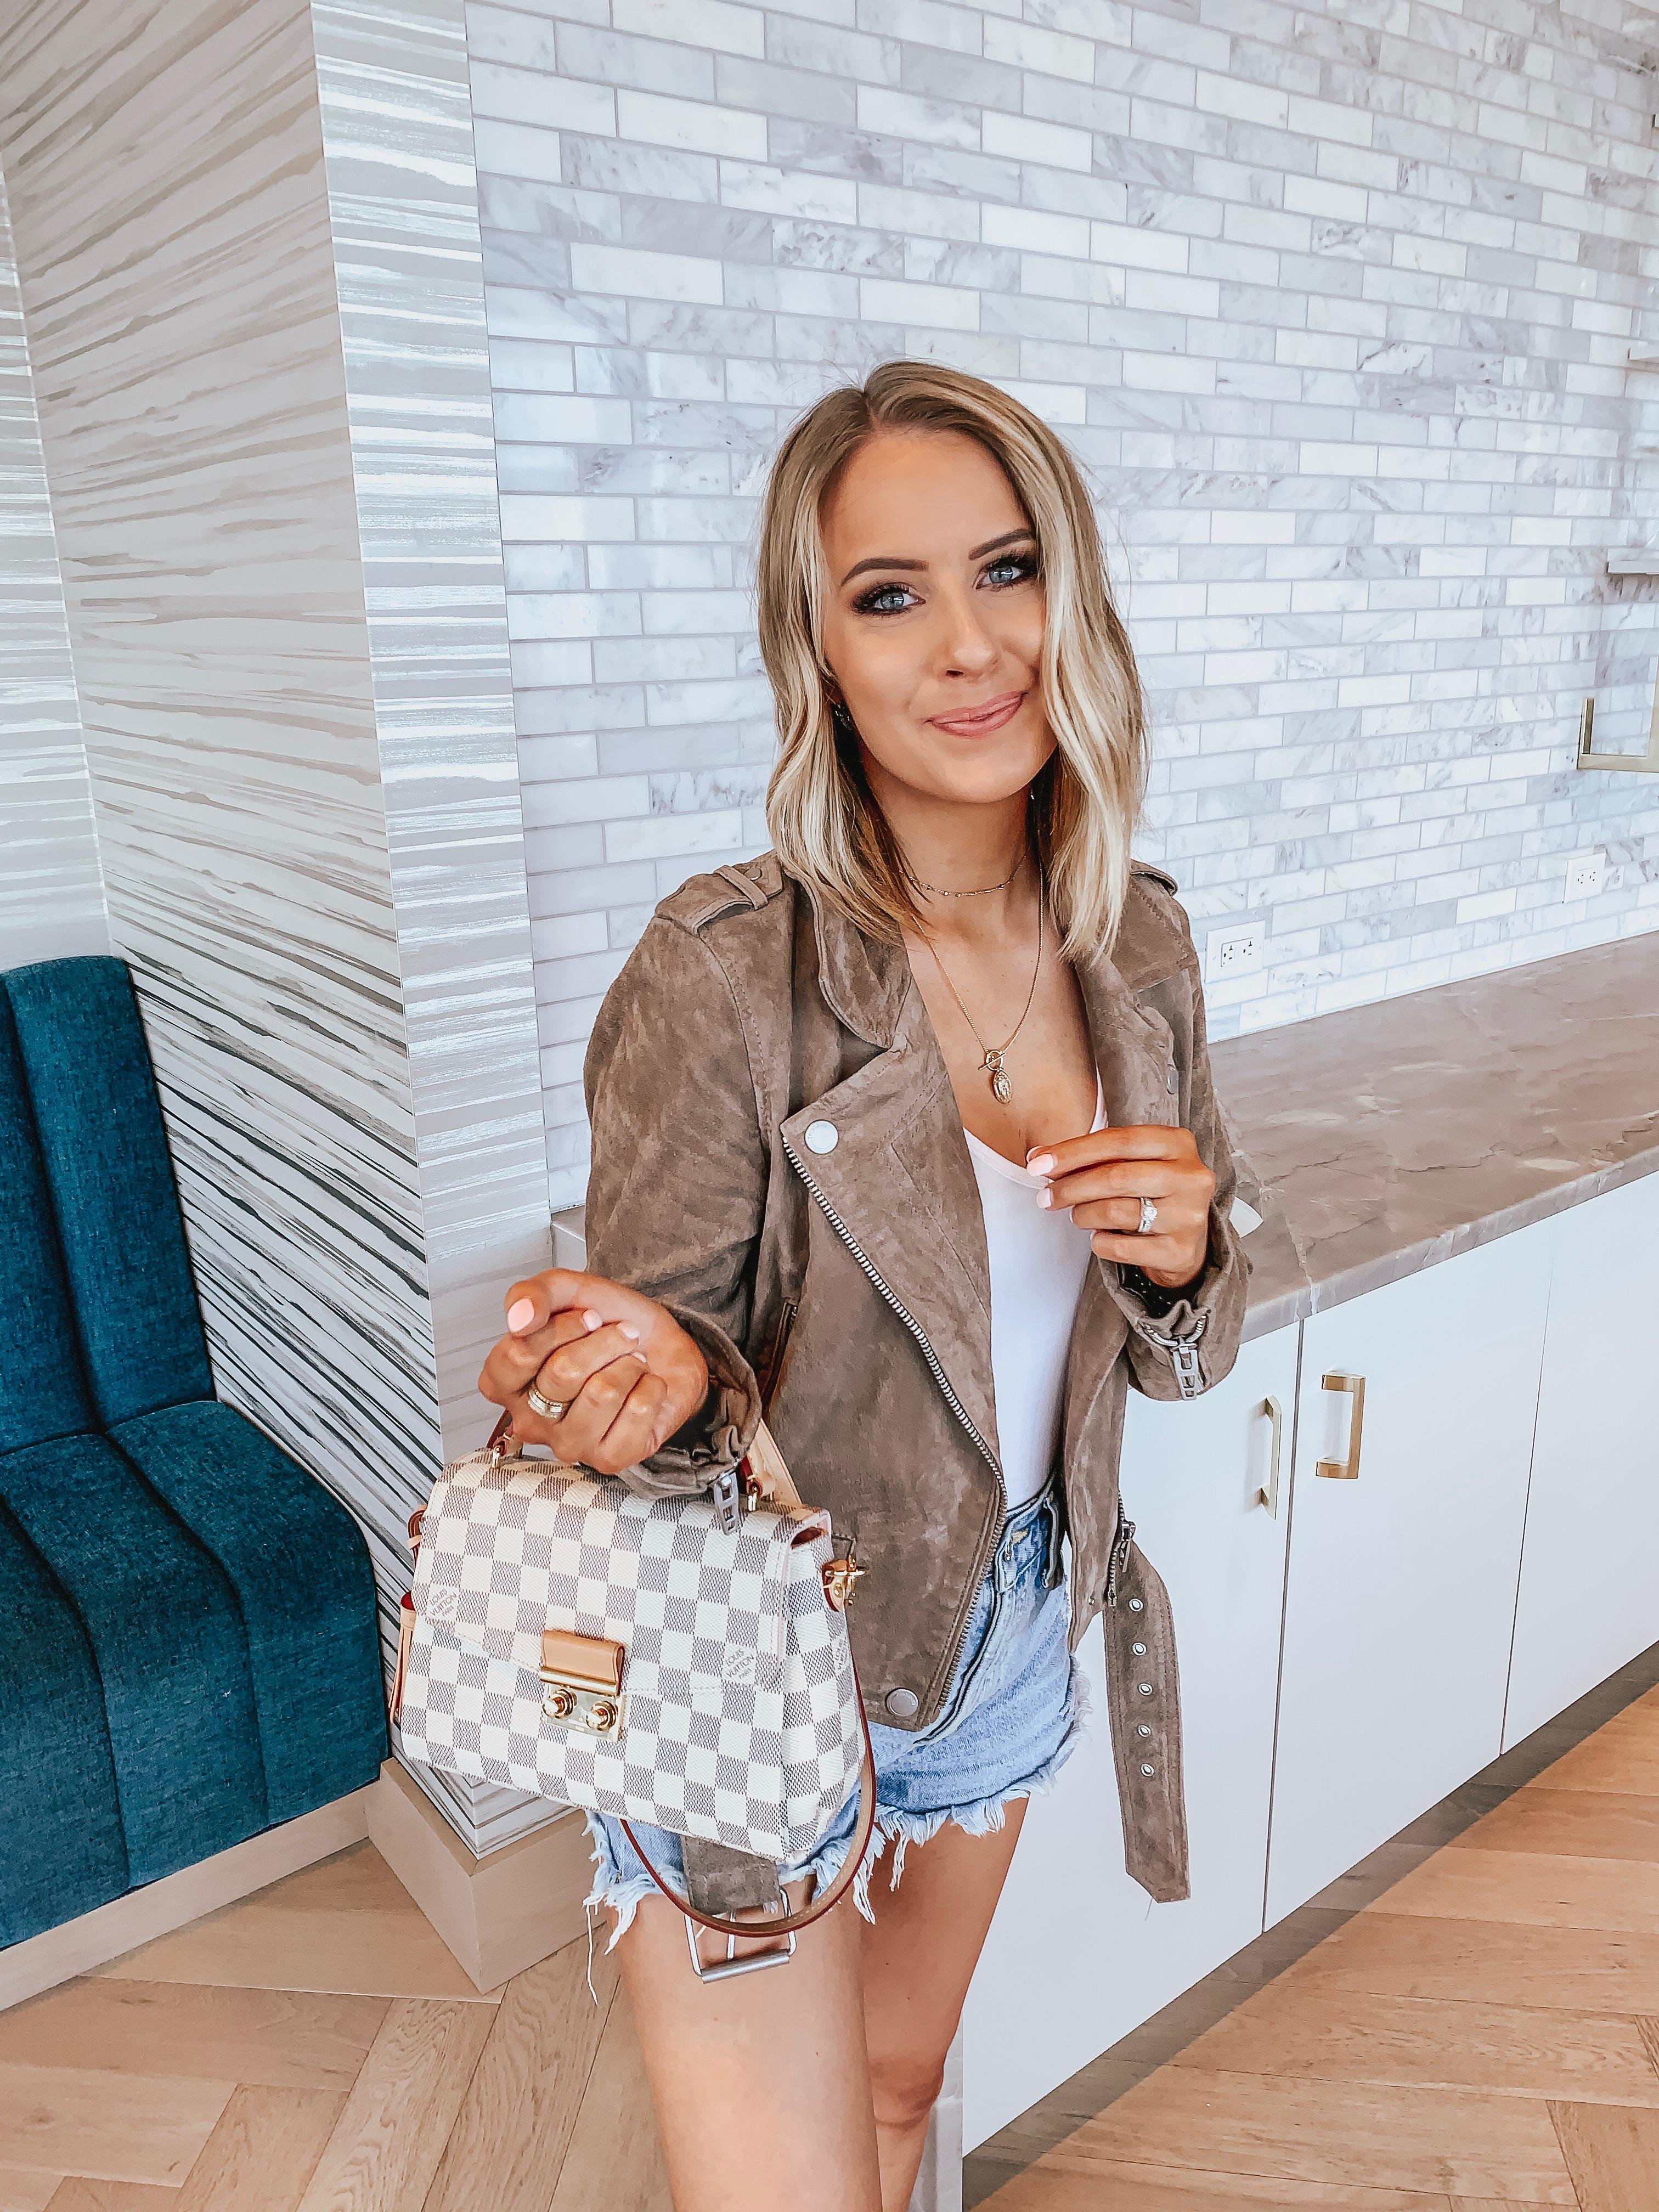 Designer Pieces for Less on Ebay | Blogger Lauren Meyer shares her Favorite Designer Pieces for Less on Ebay Fashion